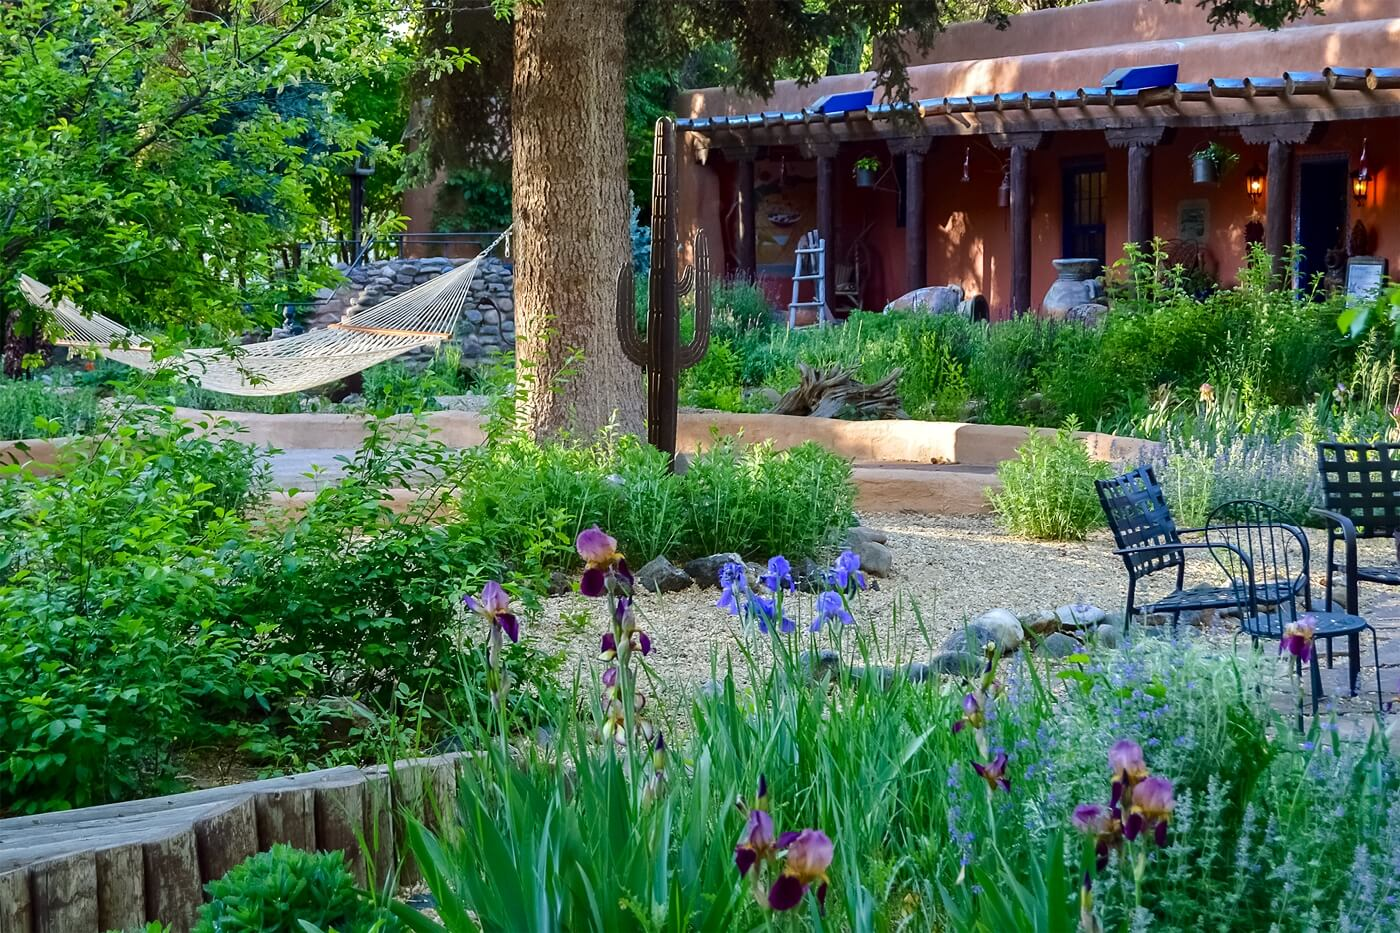 hammock in a summer garden